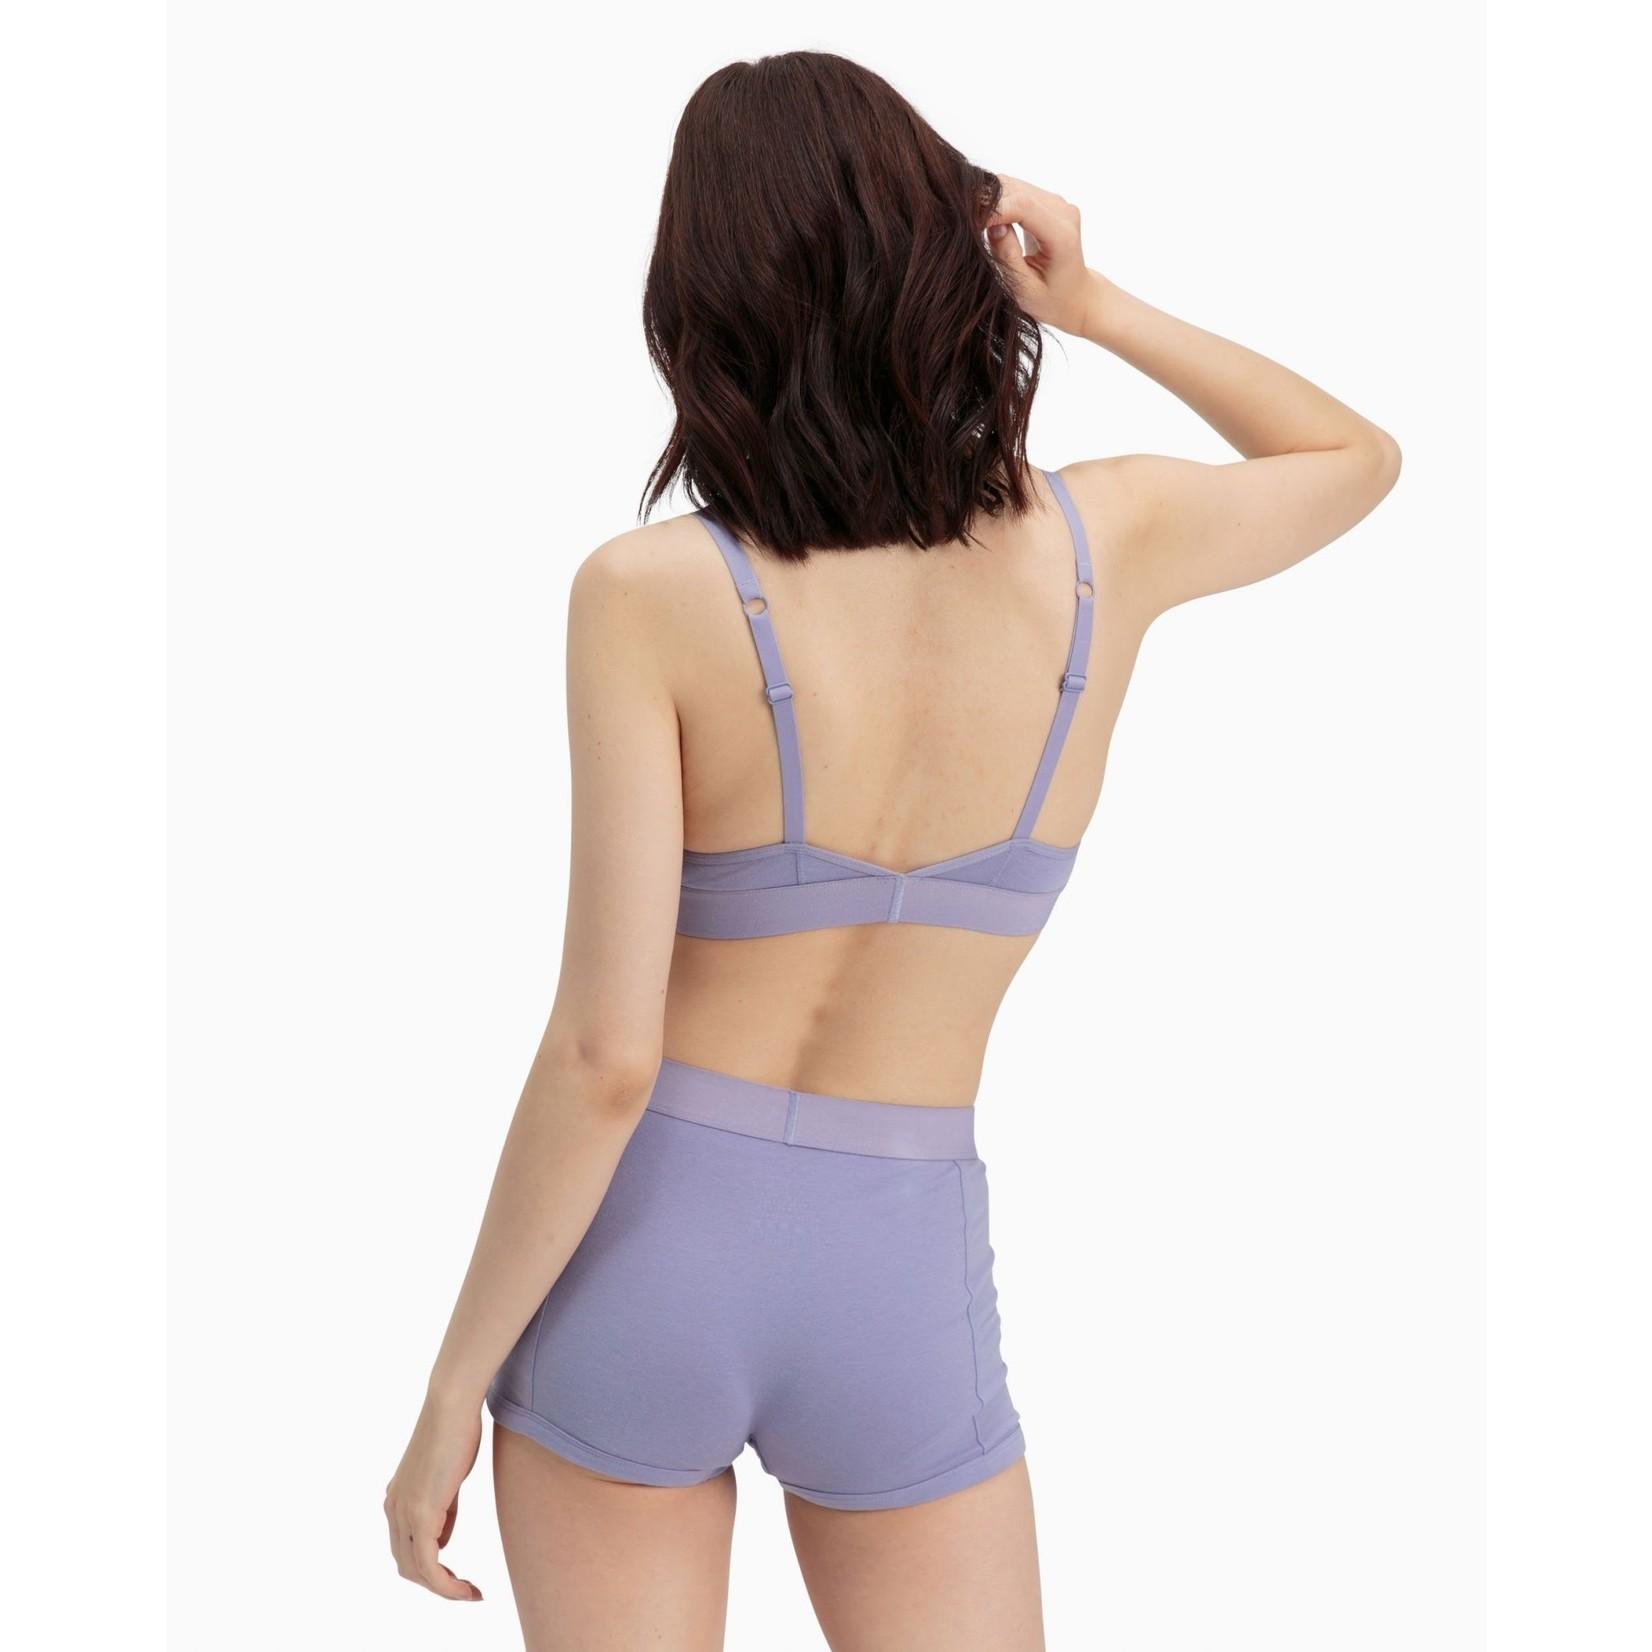 Richer Poorer Bralette CLASSIQUE violet